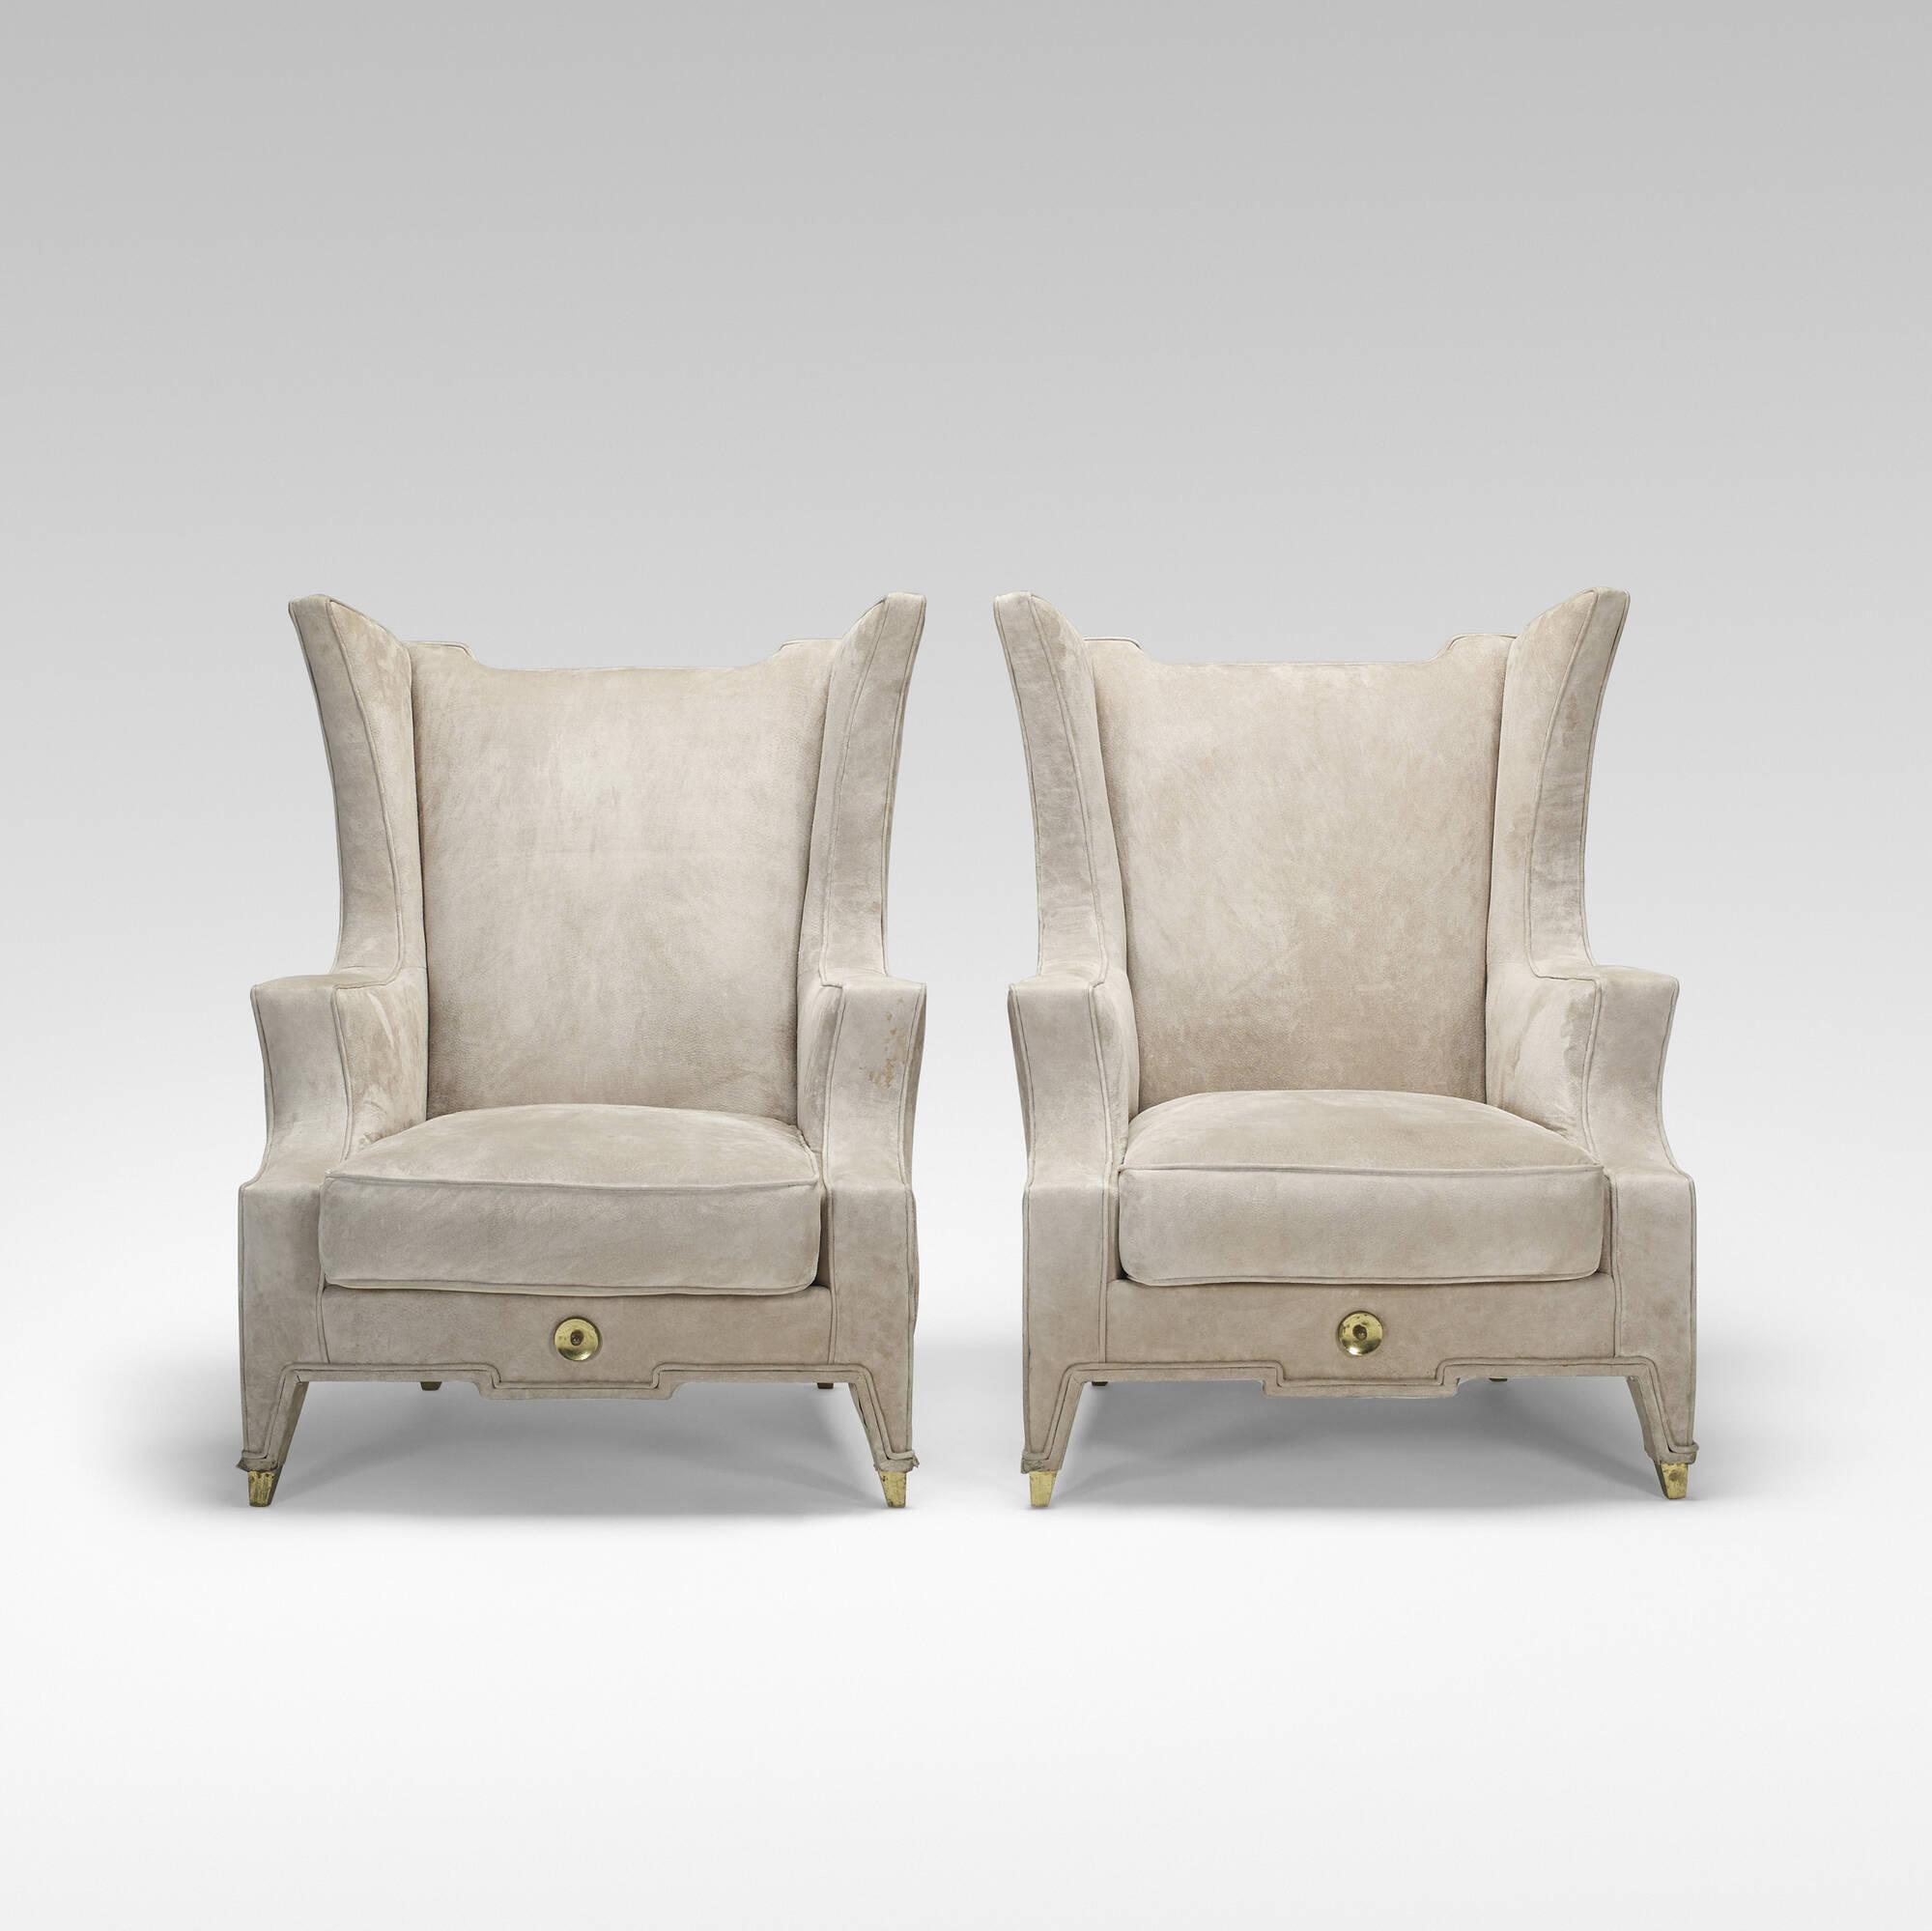 ... 174: Arturo Pani / Custom Lounge Chairs, Pair (2 Of 3)